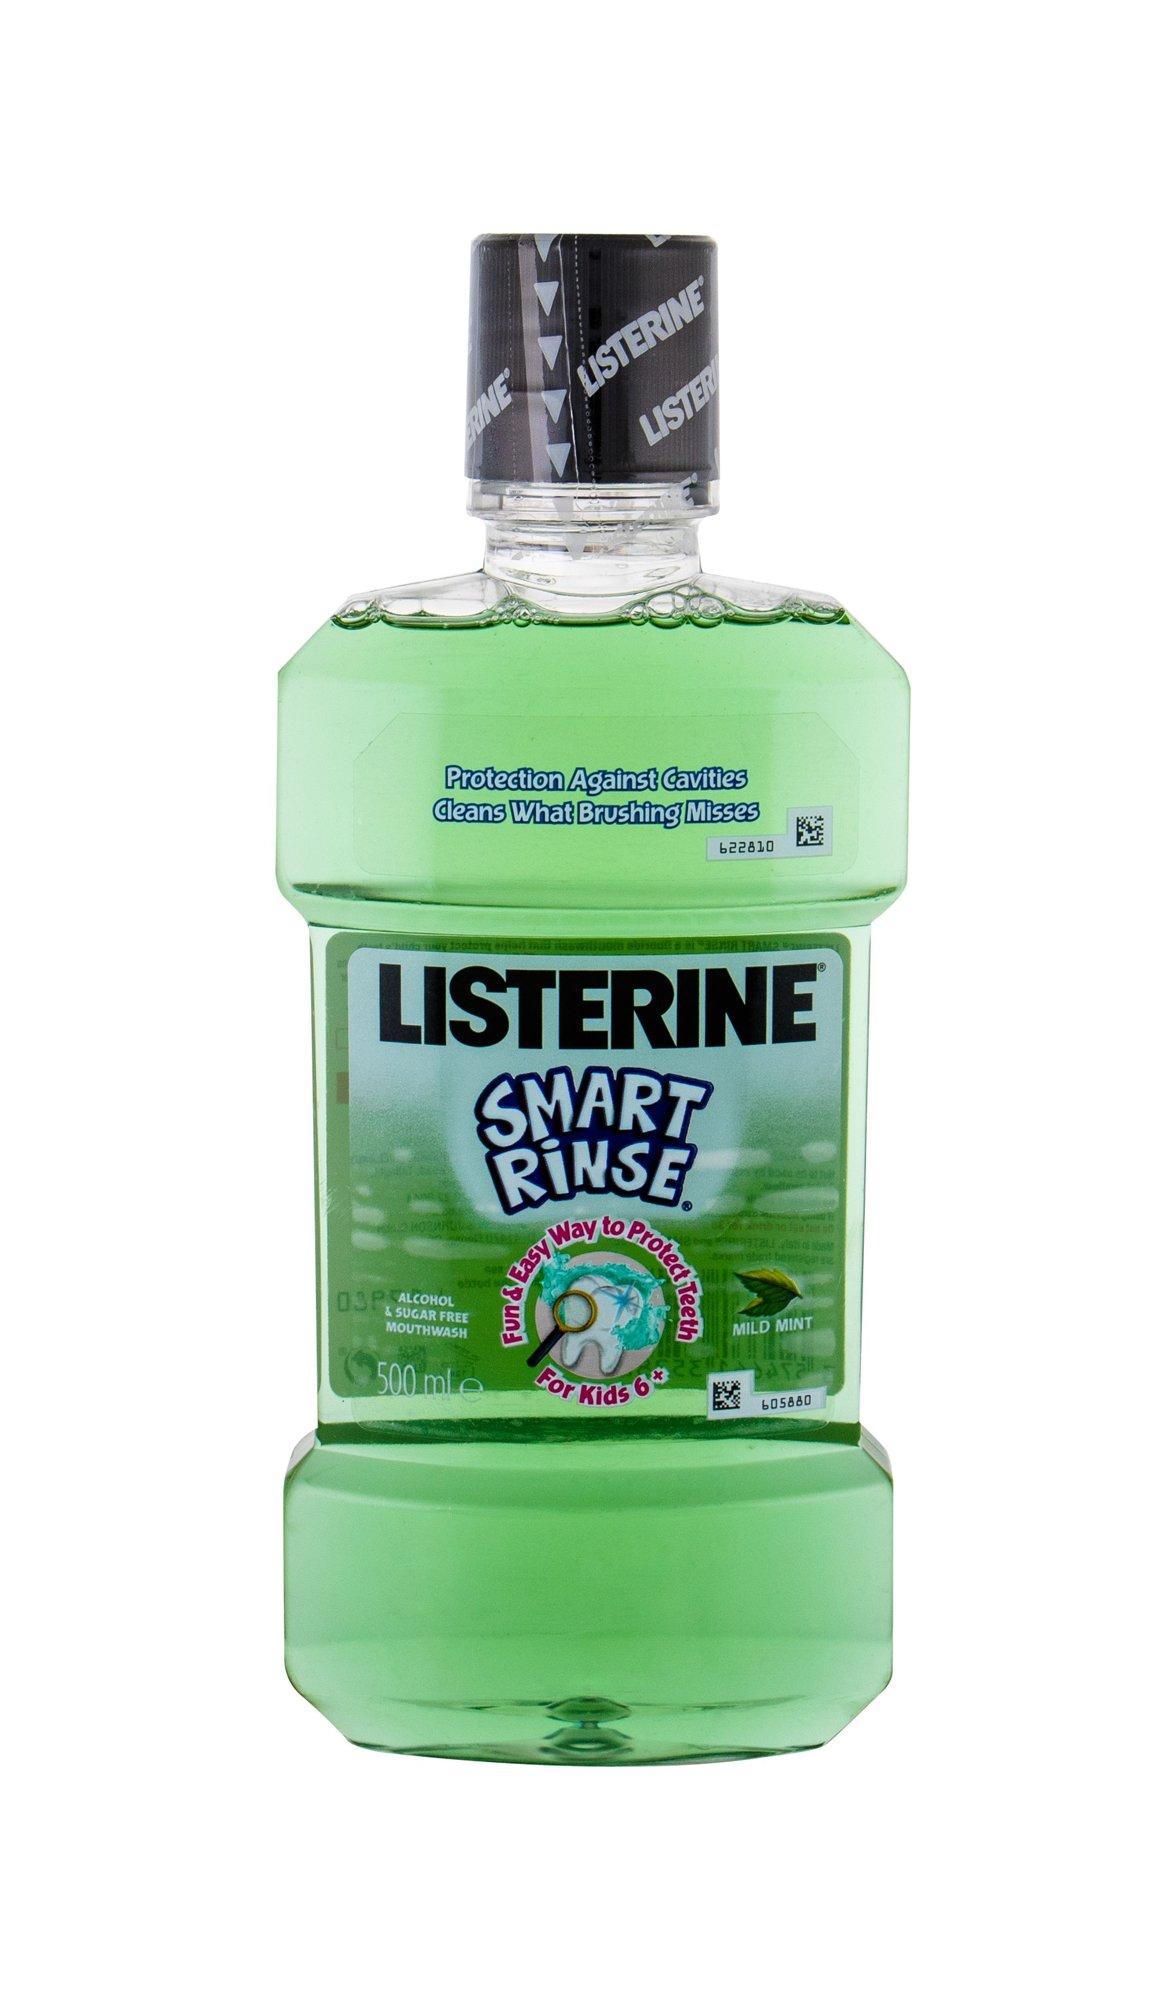 Listerine Smart Rinse Mouthwash 500ml